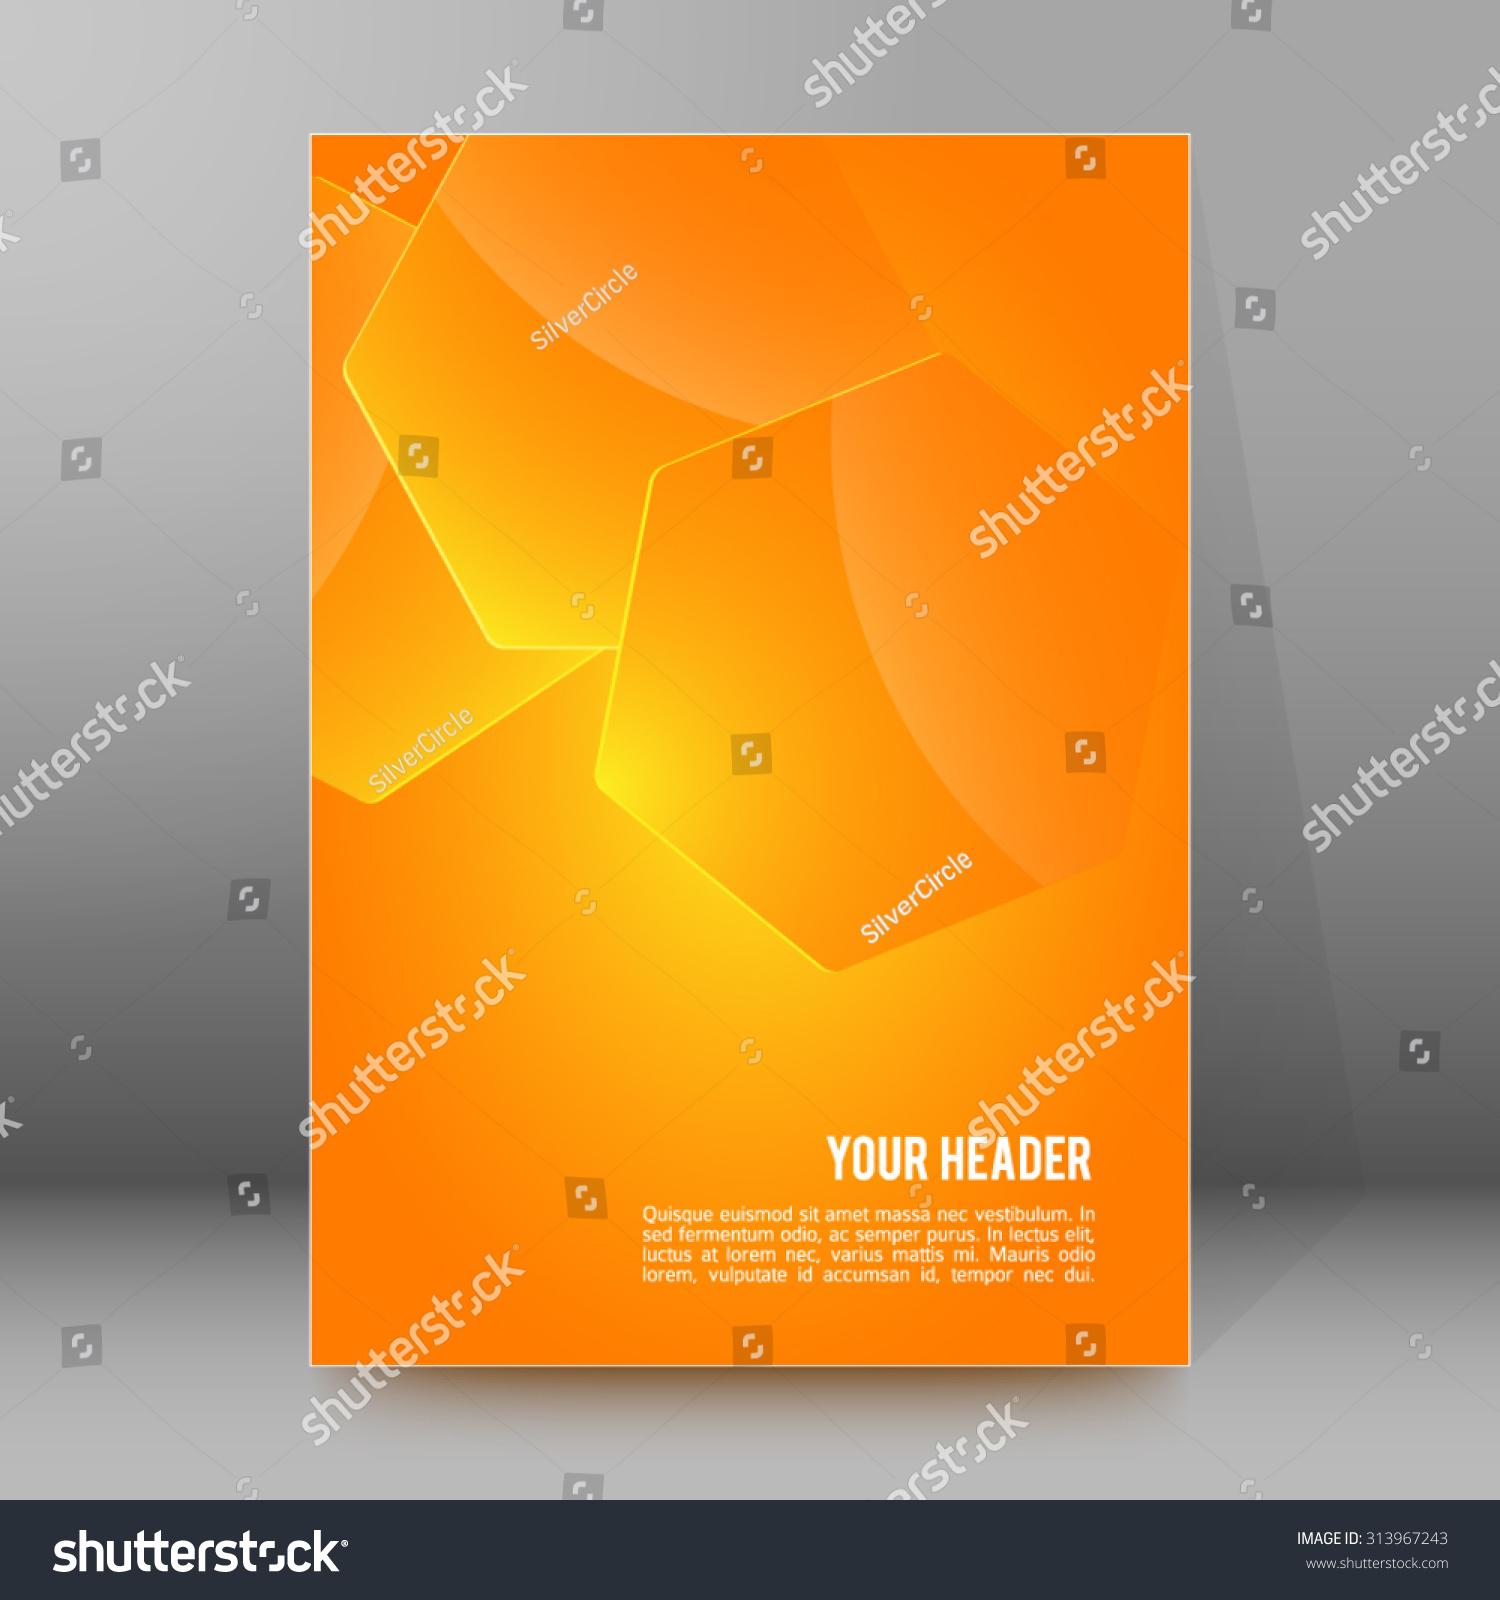 advertisement flyer design elements yellow gradient stock vector advertisement flyer design elements yellow gradient background elegant graphic hexagon bright light vector